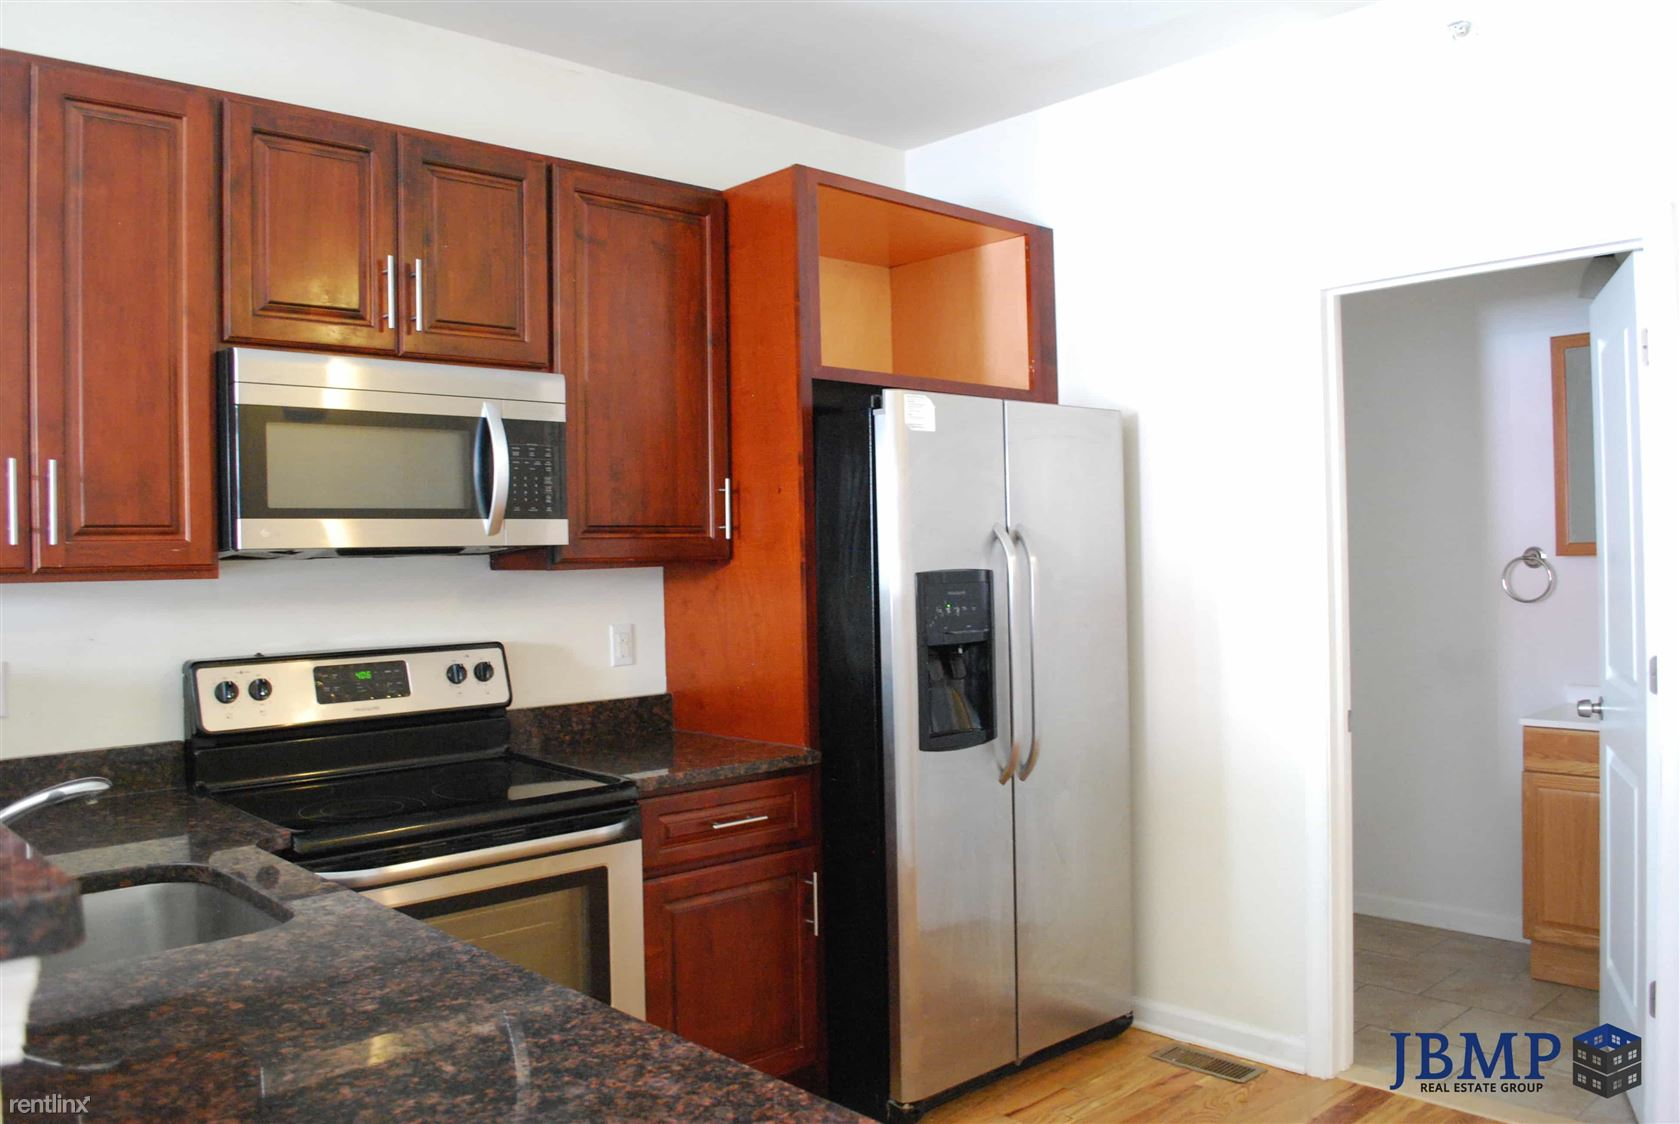 2106 N 17TH ST Unit 1, Philadelphia, PA - $2,820 USD/ month